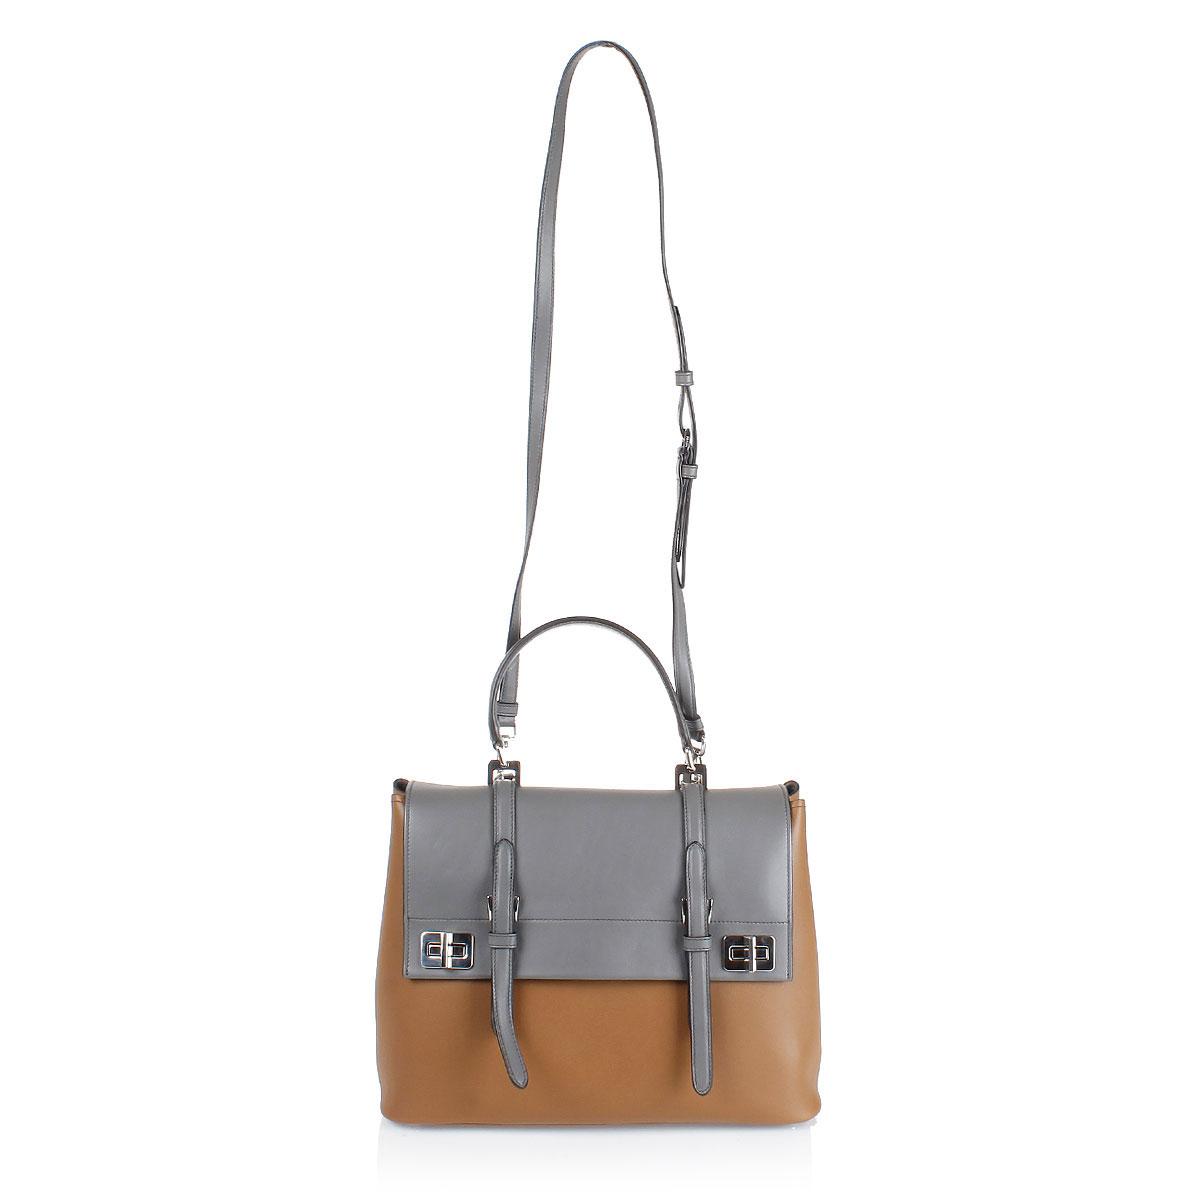 Prada Women Leather Handbag - Glamood Outlet 709f153d4d01e